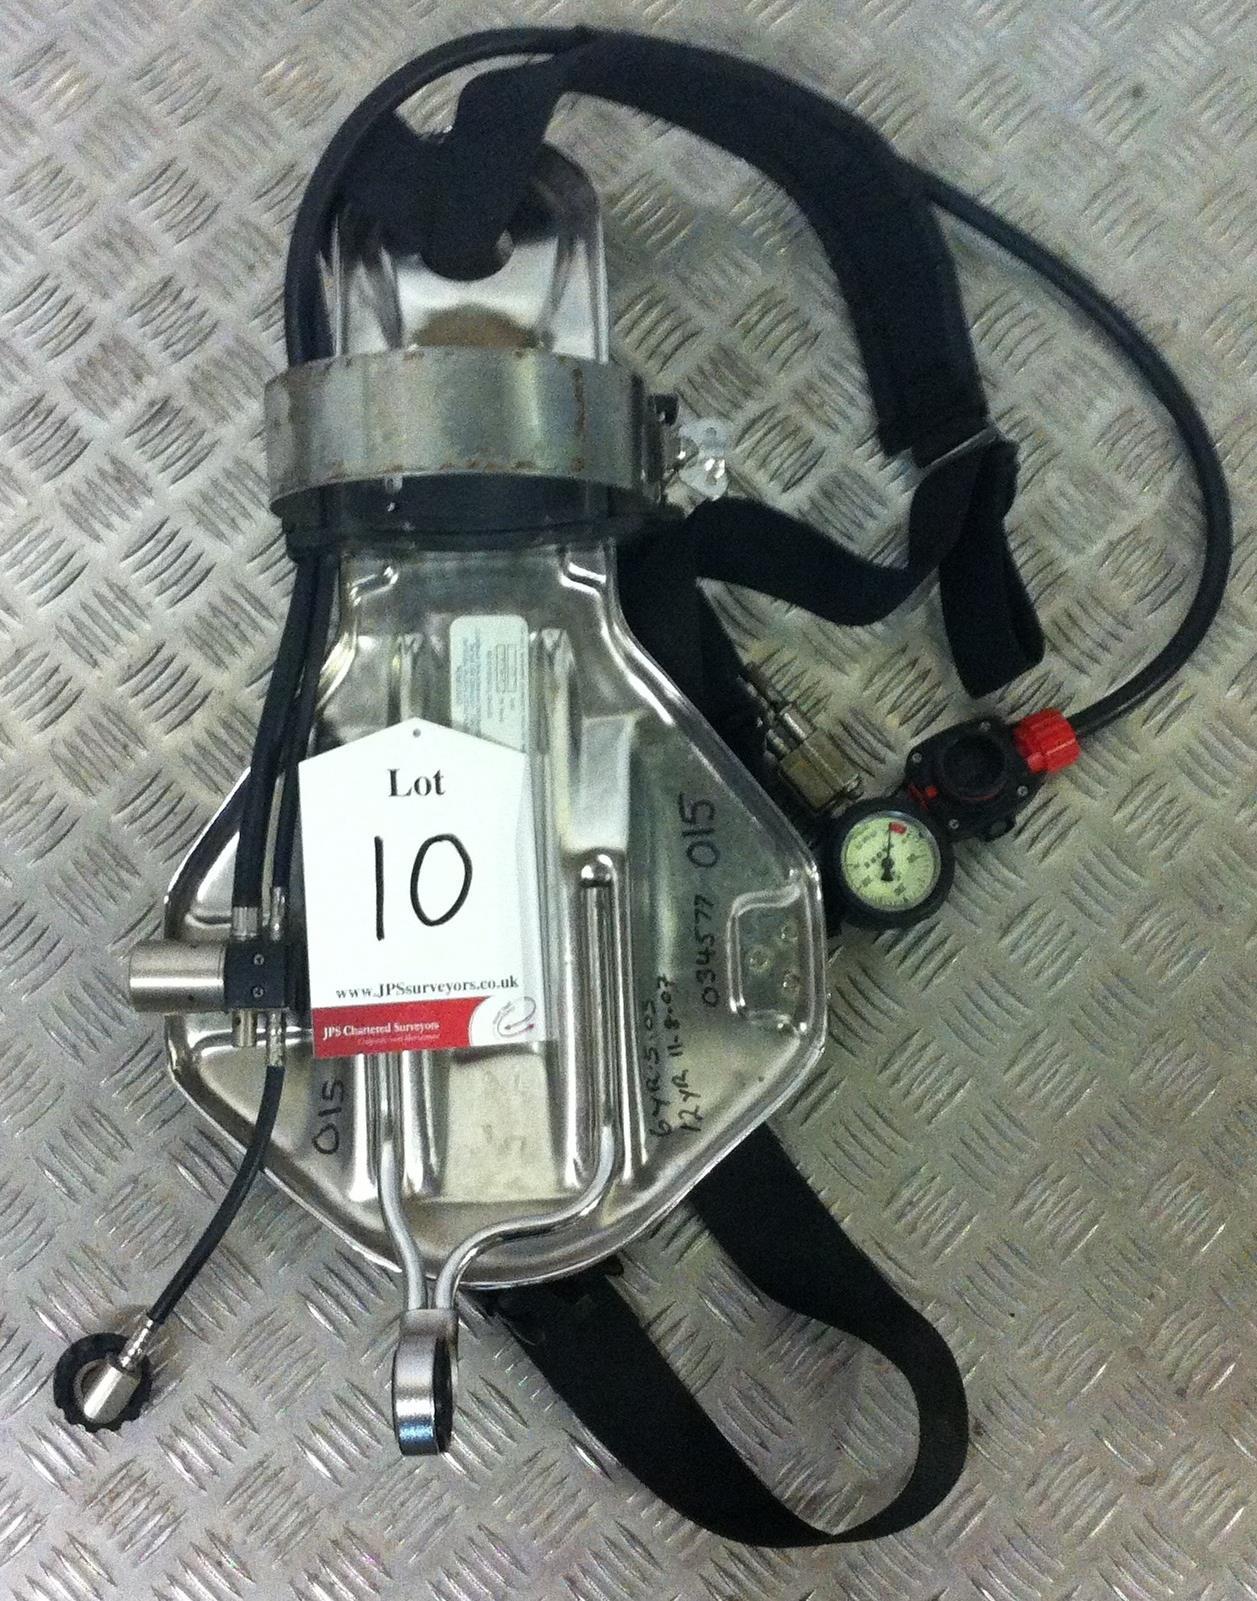 Lot 10 - Saver Centurion Breather Operator